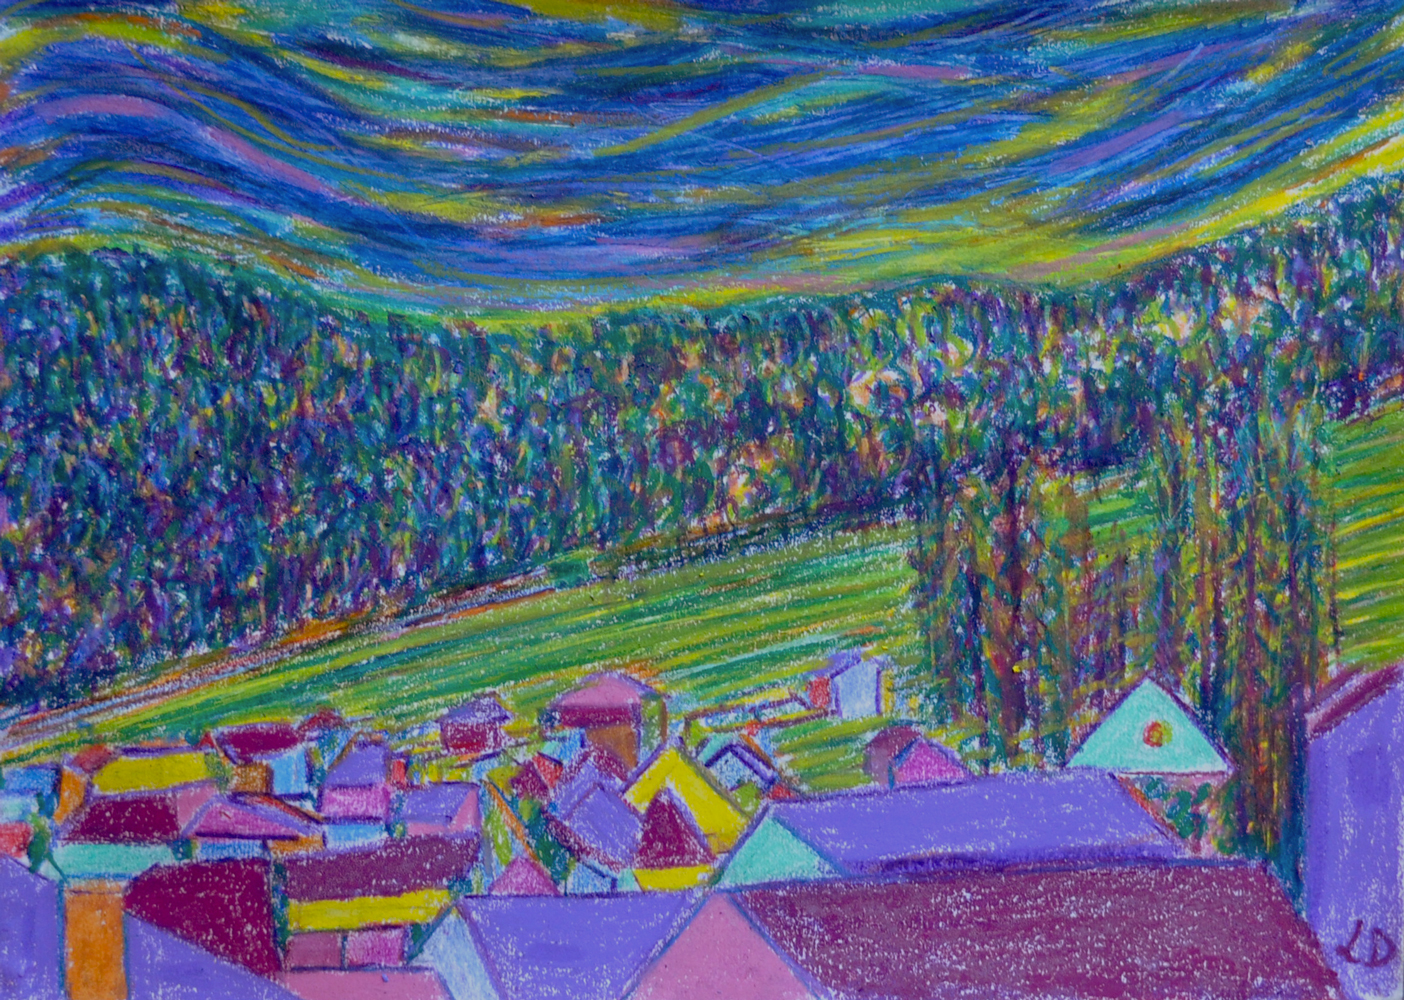 Les toits, Penthalaz no.2. Mixed media sur papier, 21x30, 2019